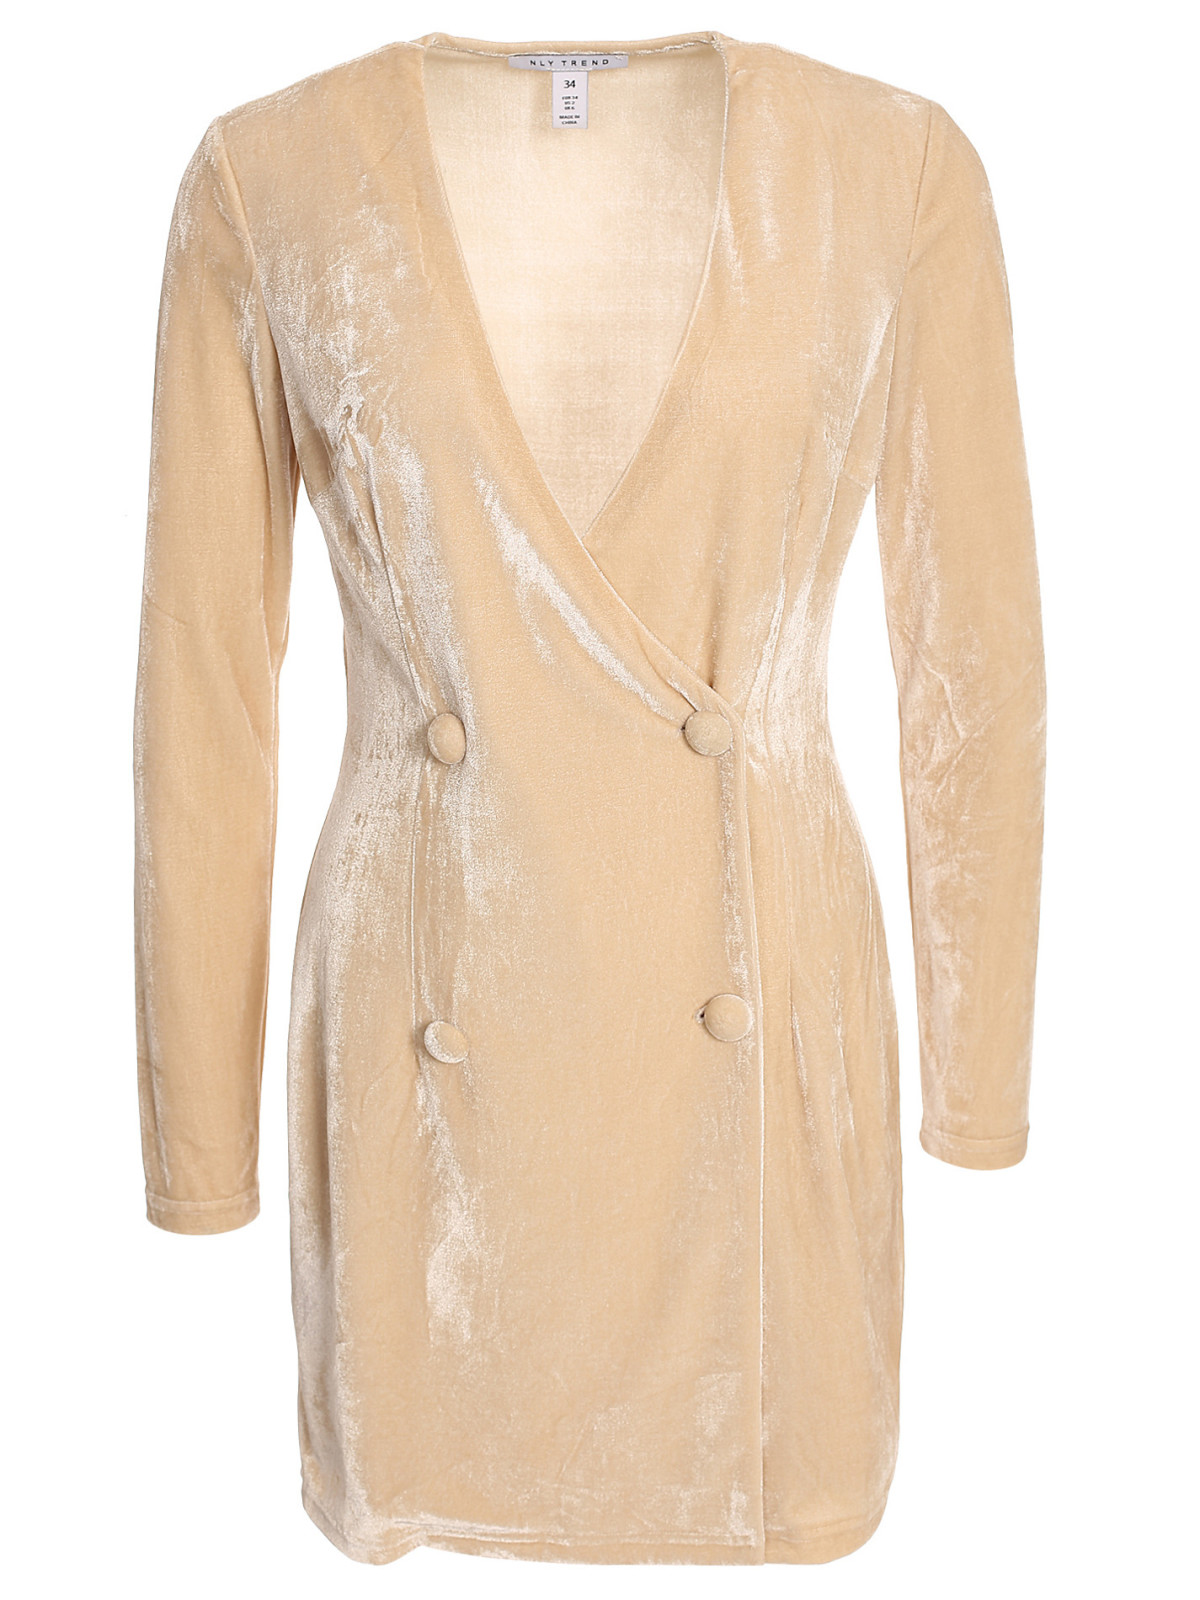 sammet-kostym-klanning-1200x1600